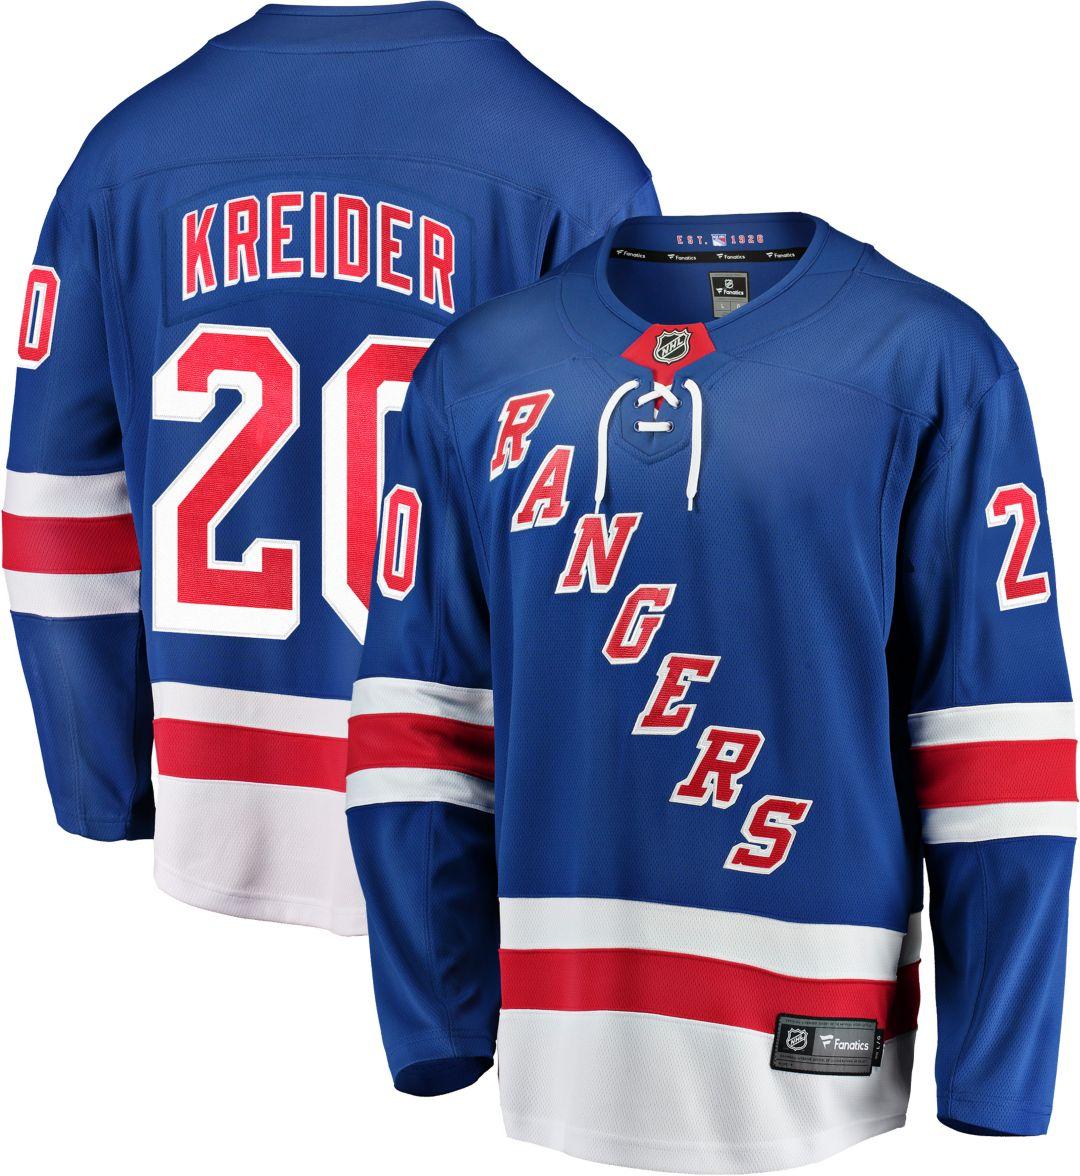 new style 943d4 e8952 NHL Men's New York Rangers Chris Kreider #20 Breakaway Home Replica Jersey